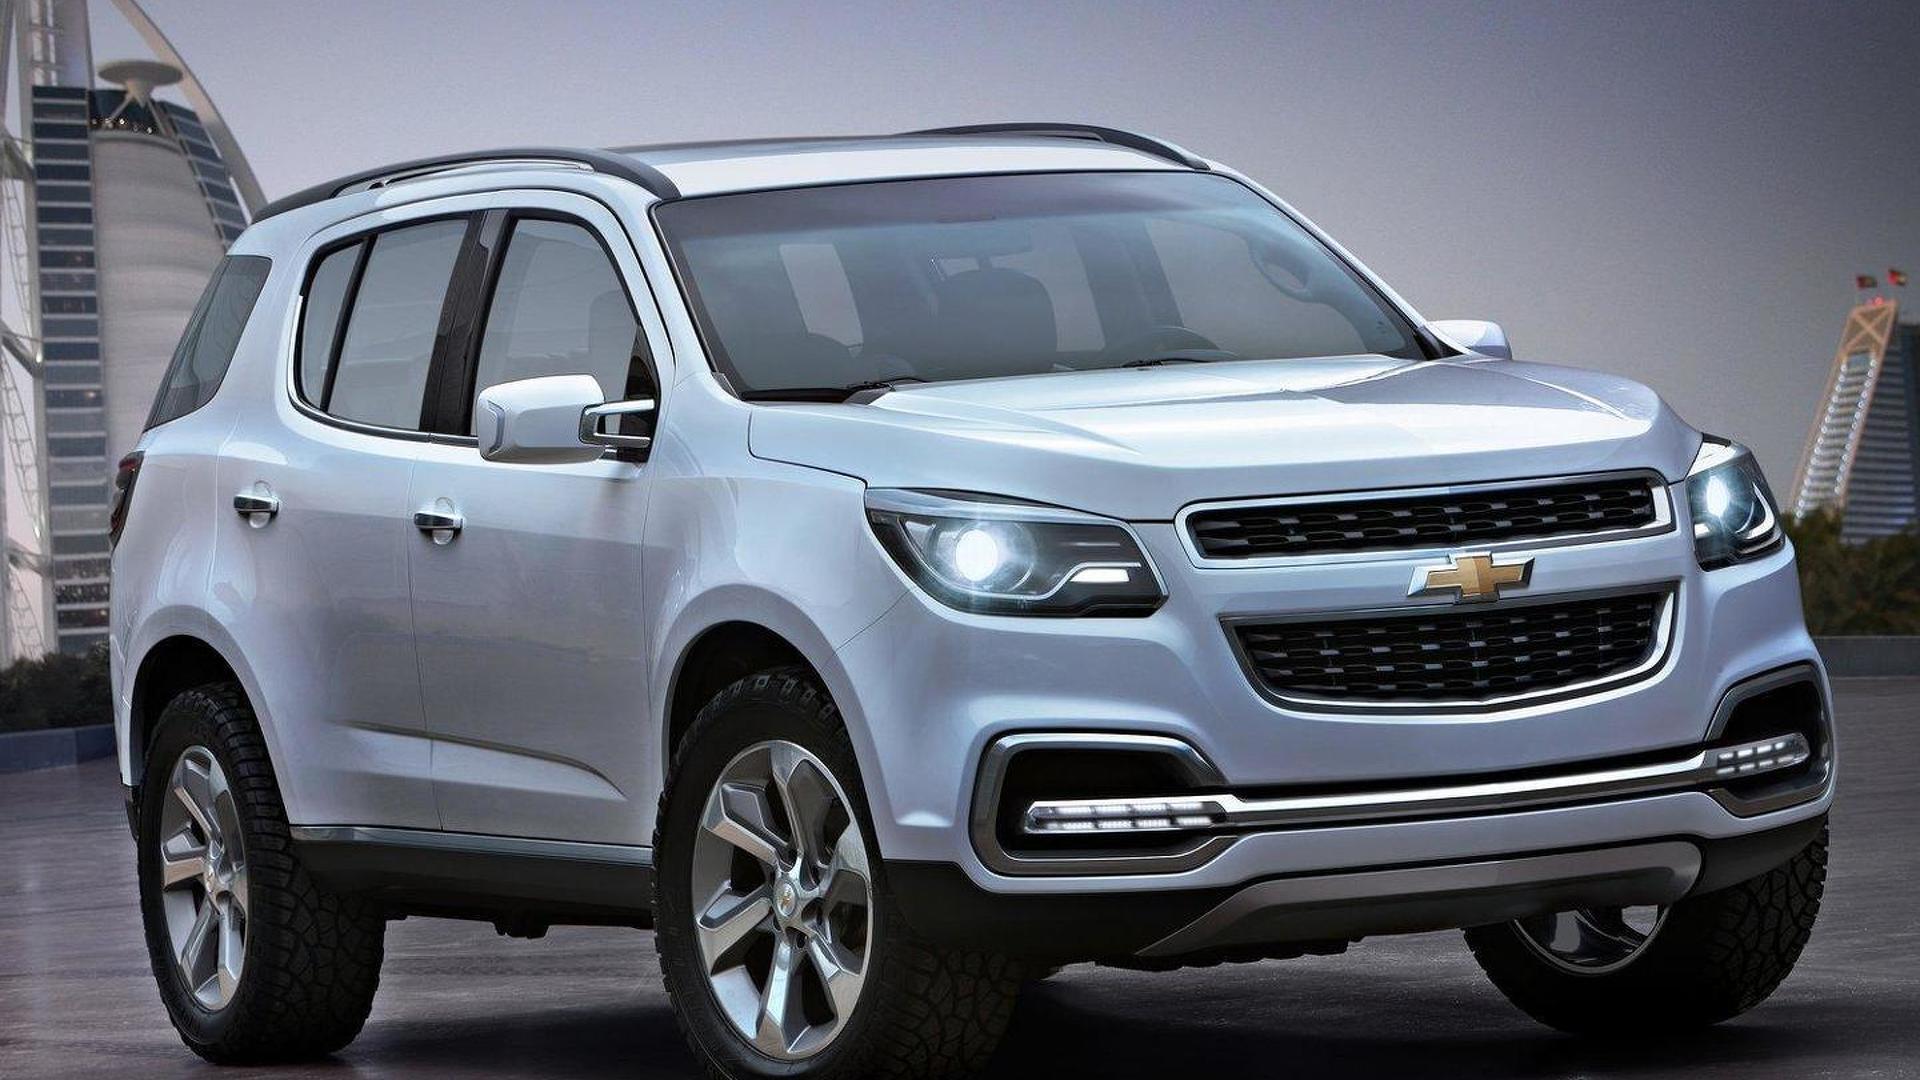 Kelebihan Kekurangan Chevrolet 2012 Review